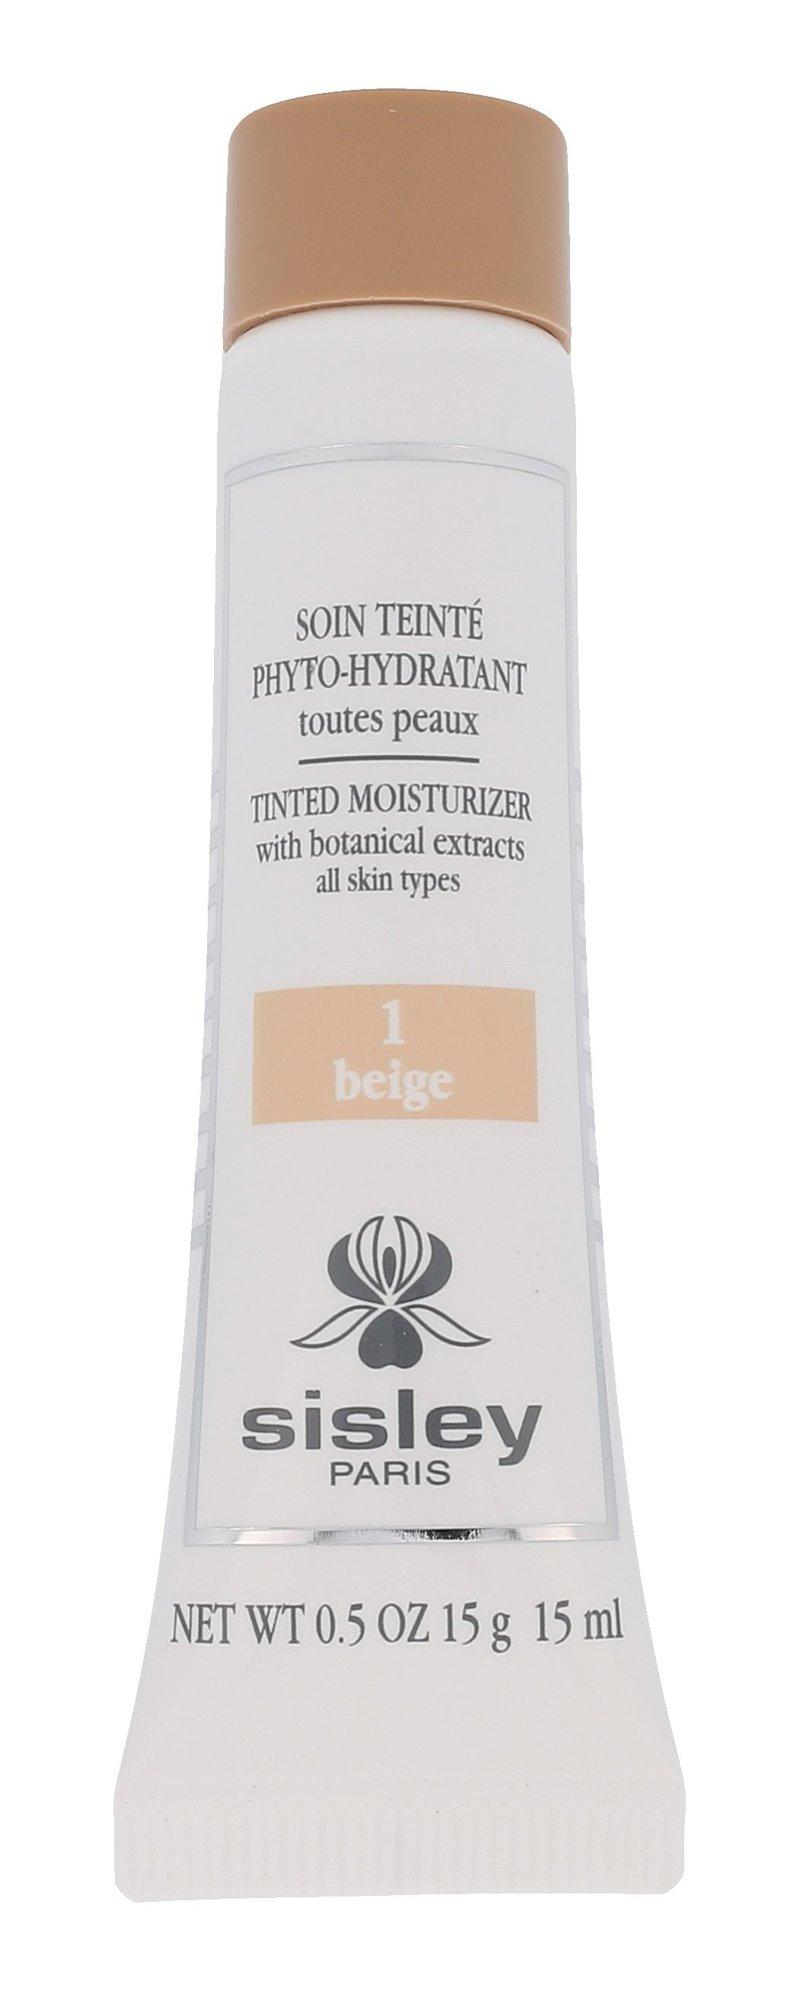 Sisley Tinted Moisturizer Cosmetic 15ml 1 Beige